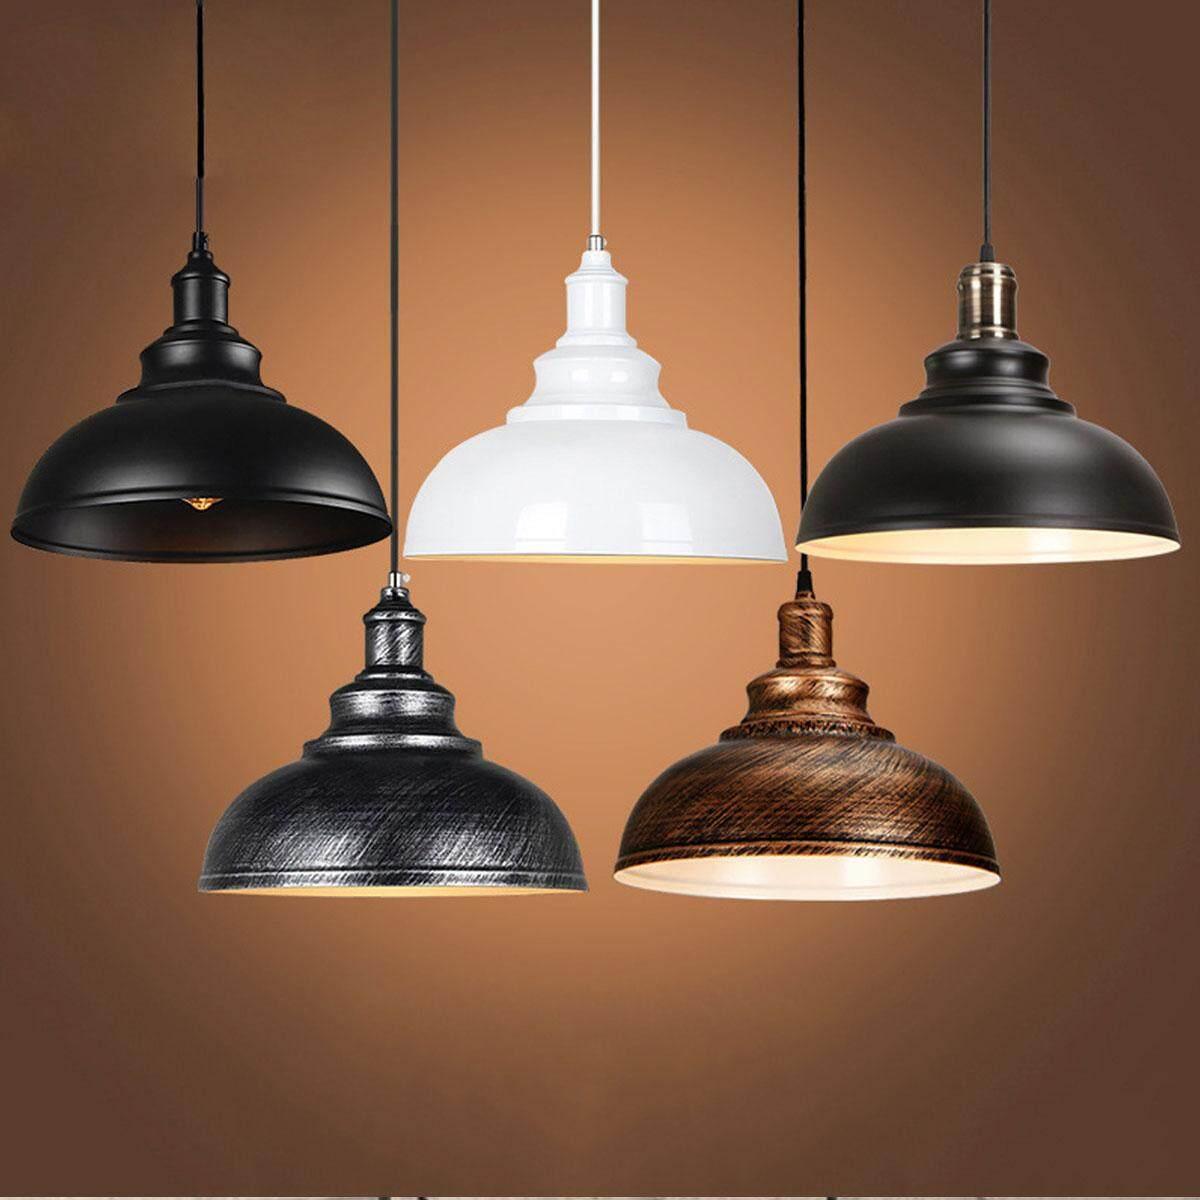 【Free Shipping + Flash Deal】Retro Fixture Ceiling Light Vintage Pendant Lamp Industrial Loft Iron Chandelier